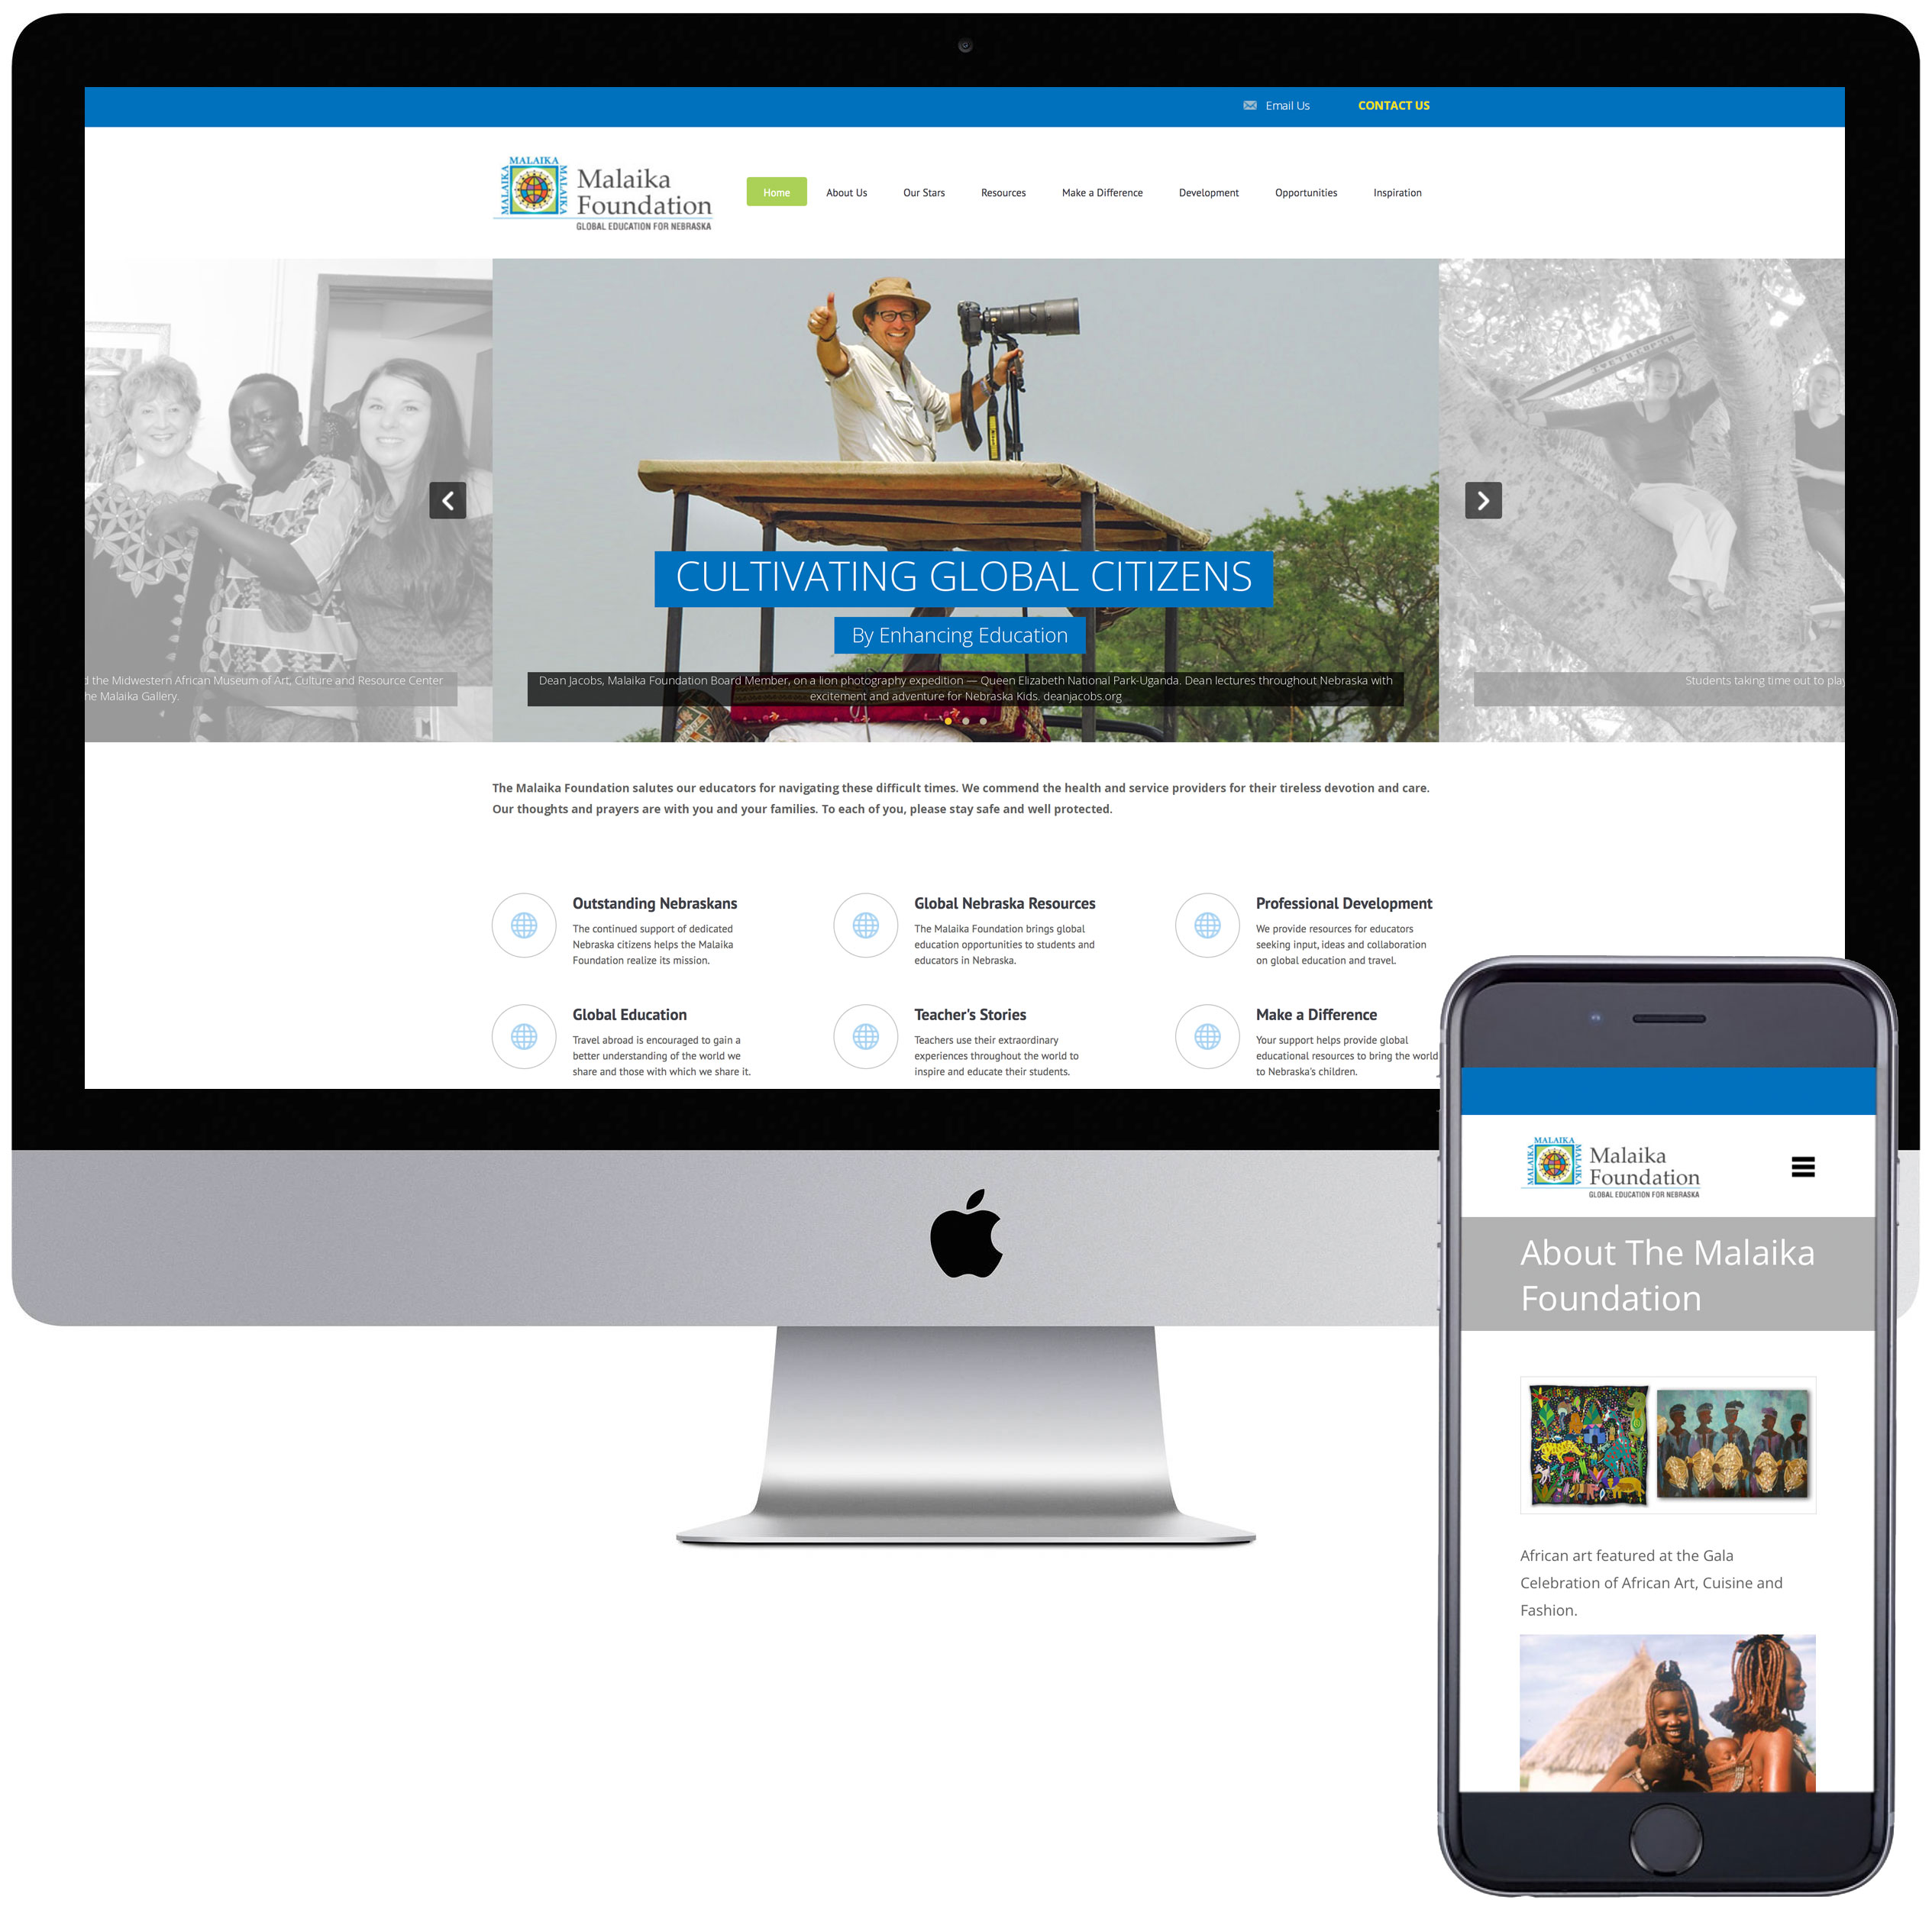 Malaika Foundation website.